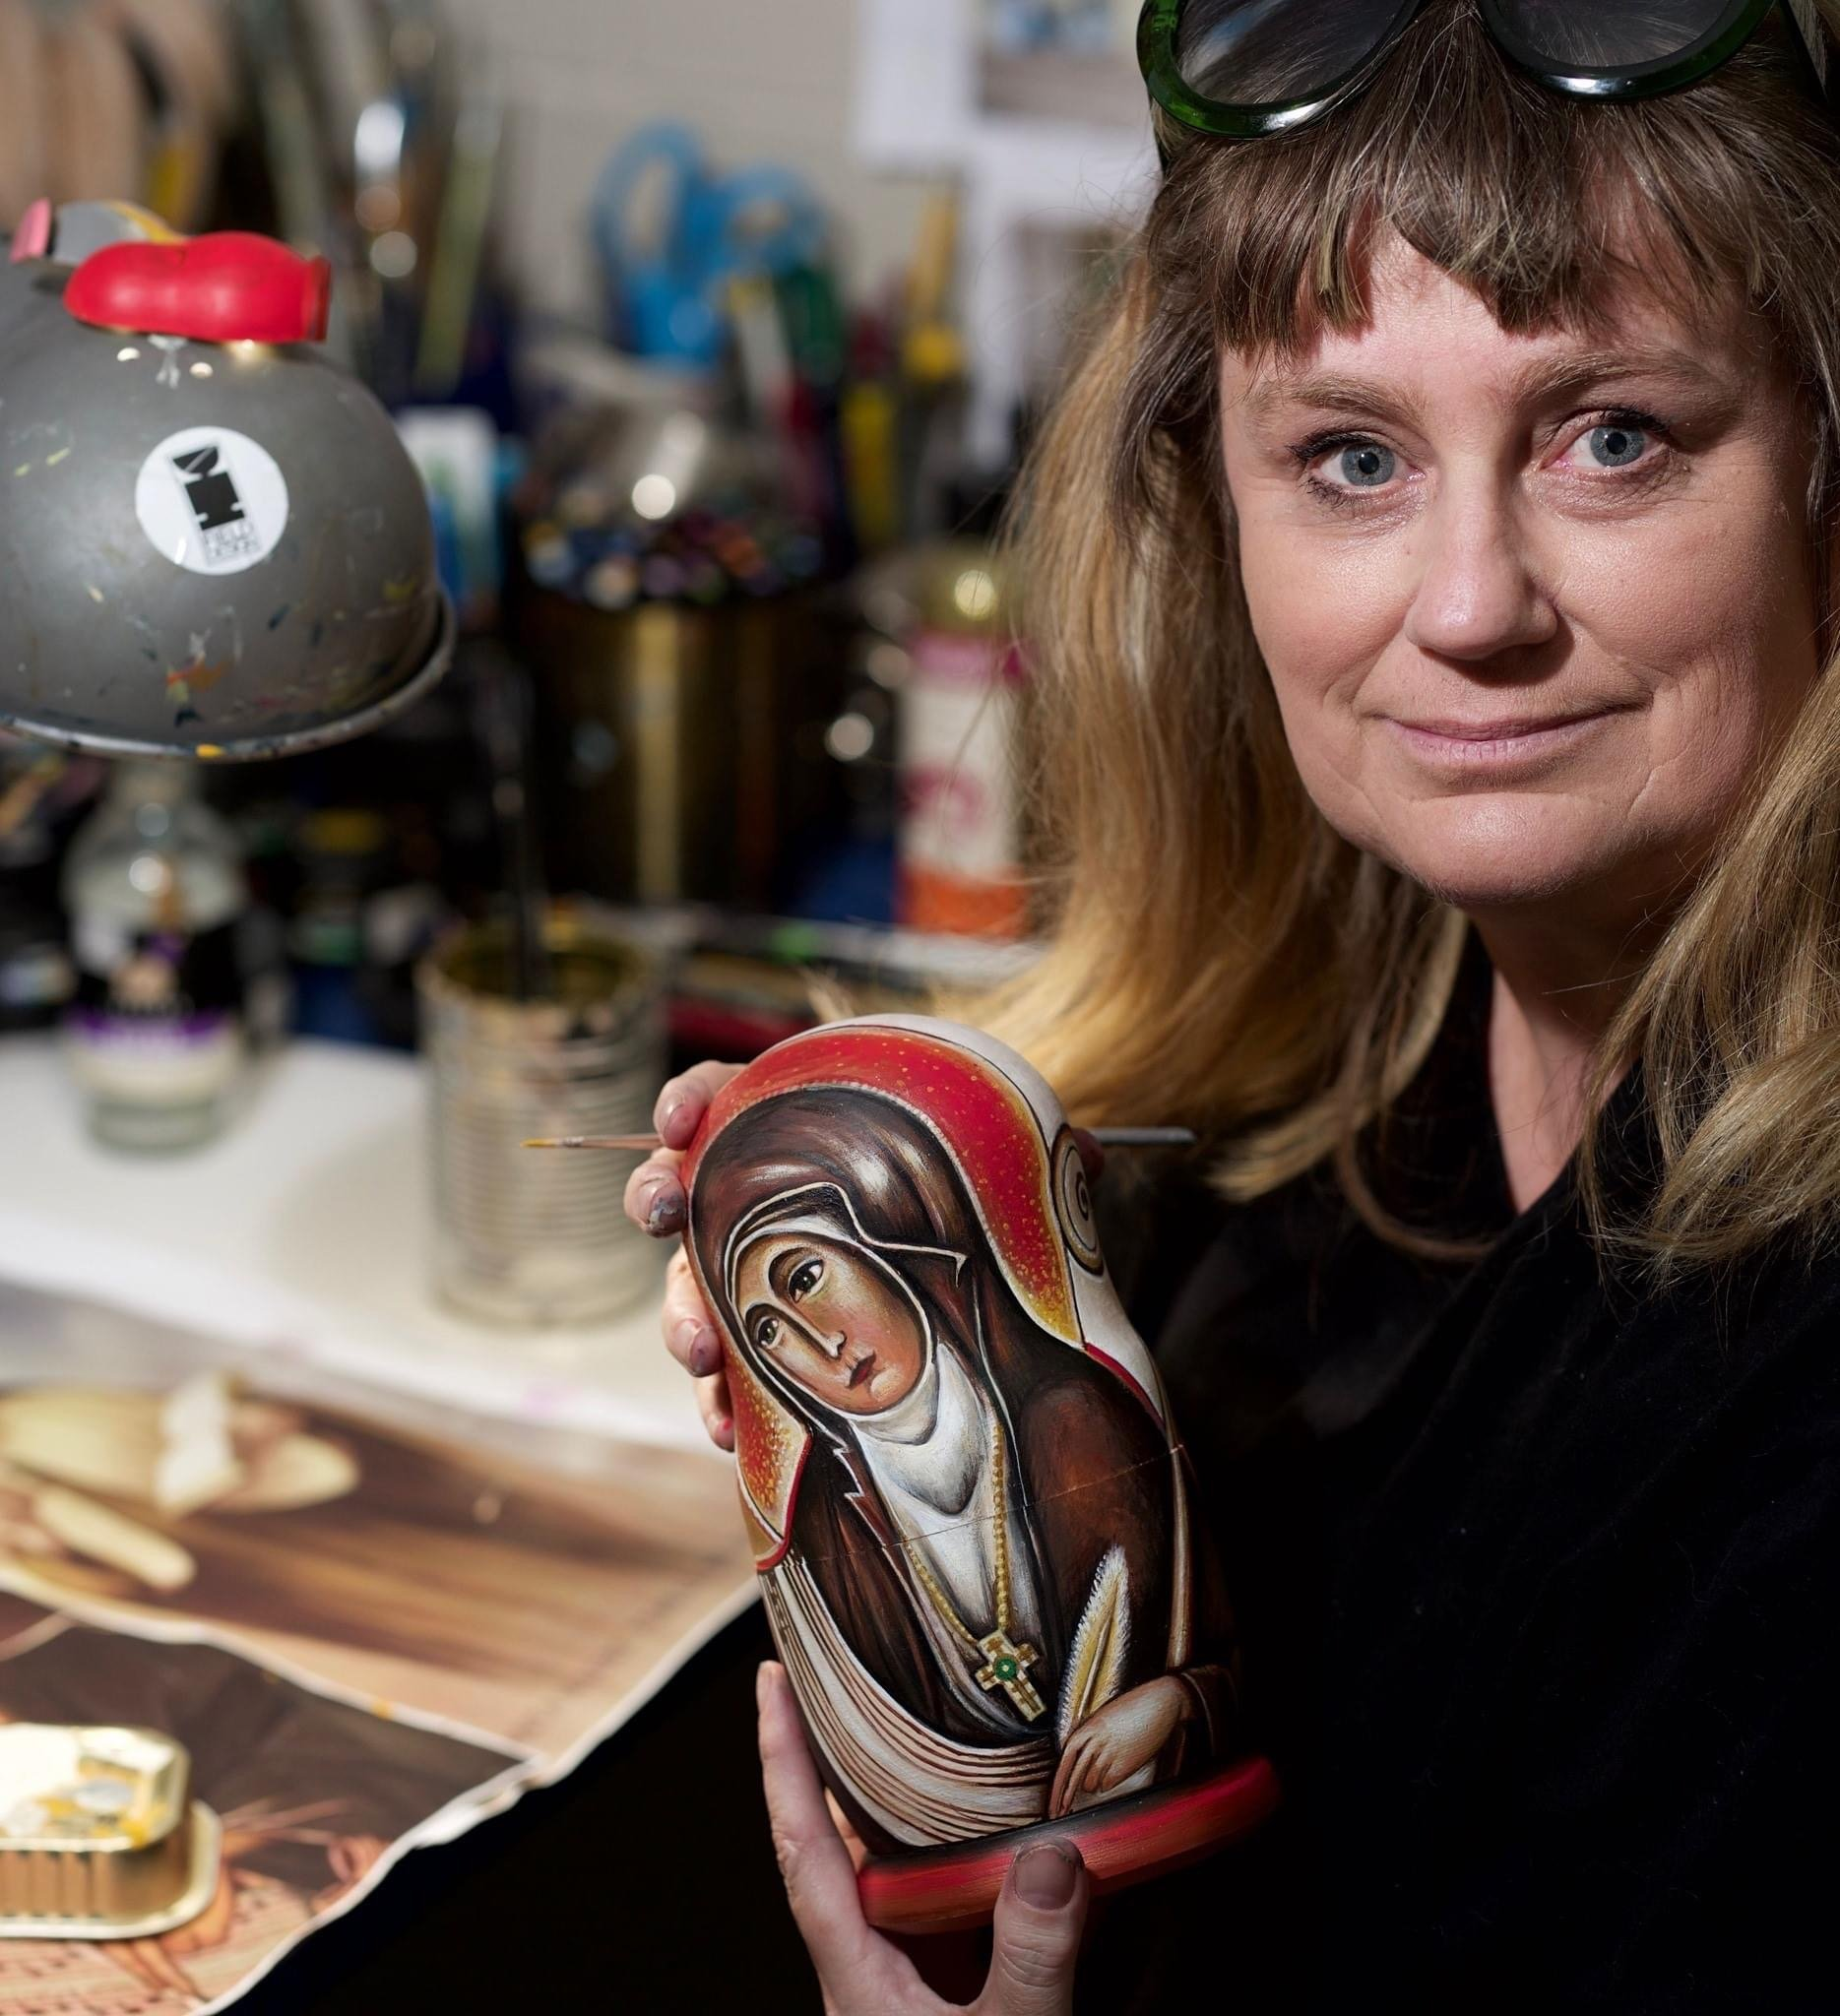 Dunedin artist Kezia Field paints Russian nesting dolls with images of inspirational women to...